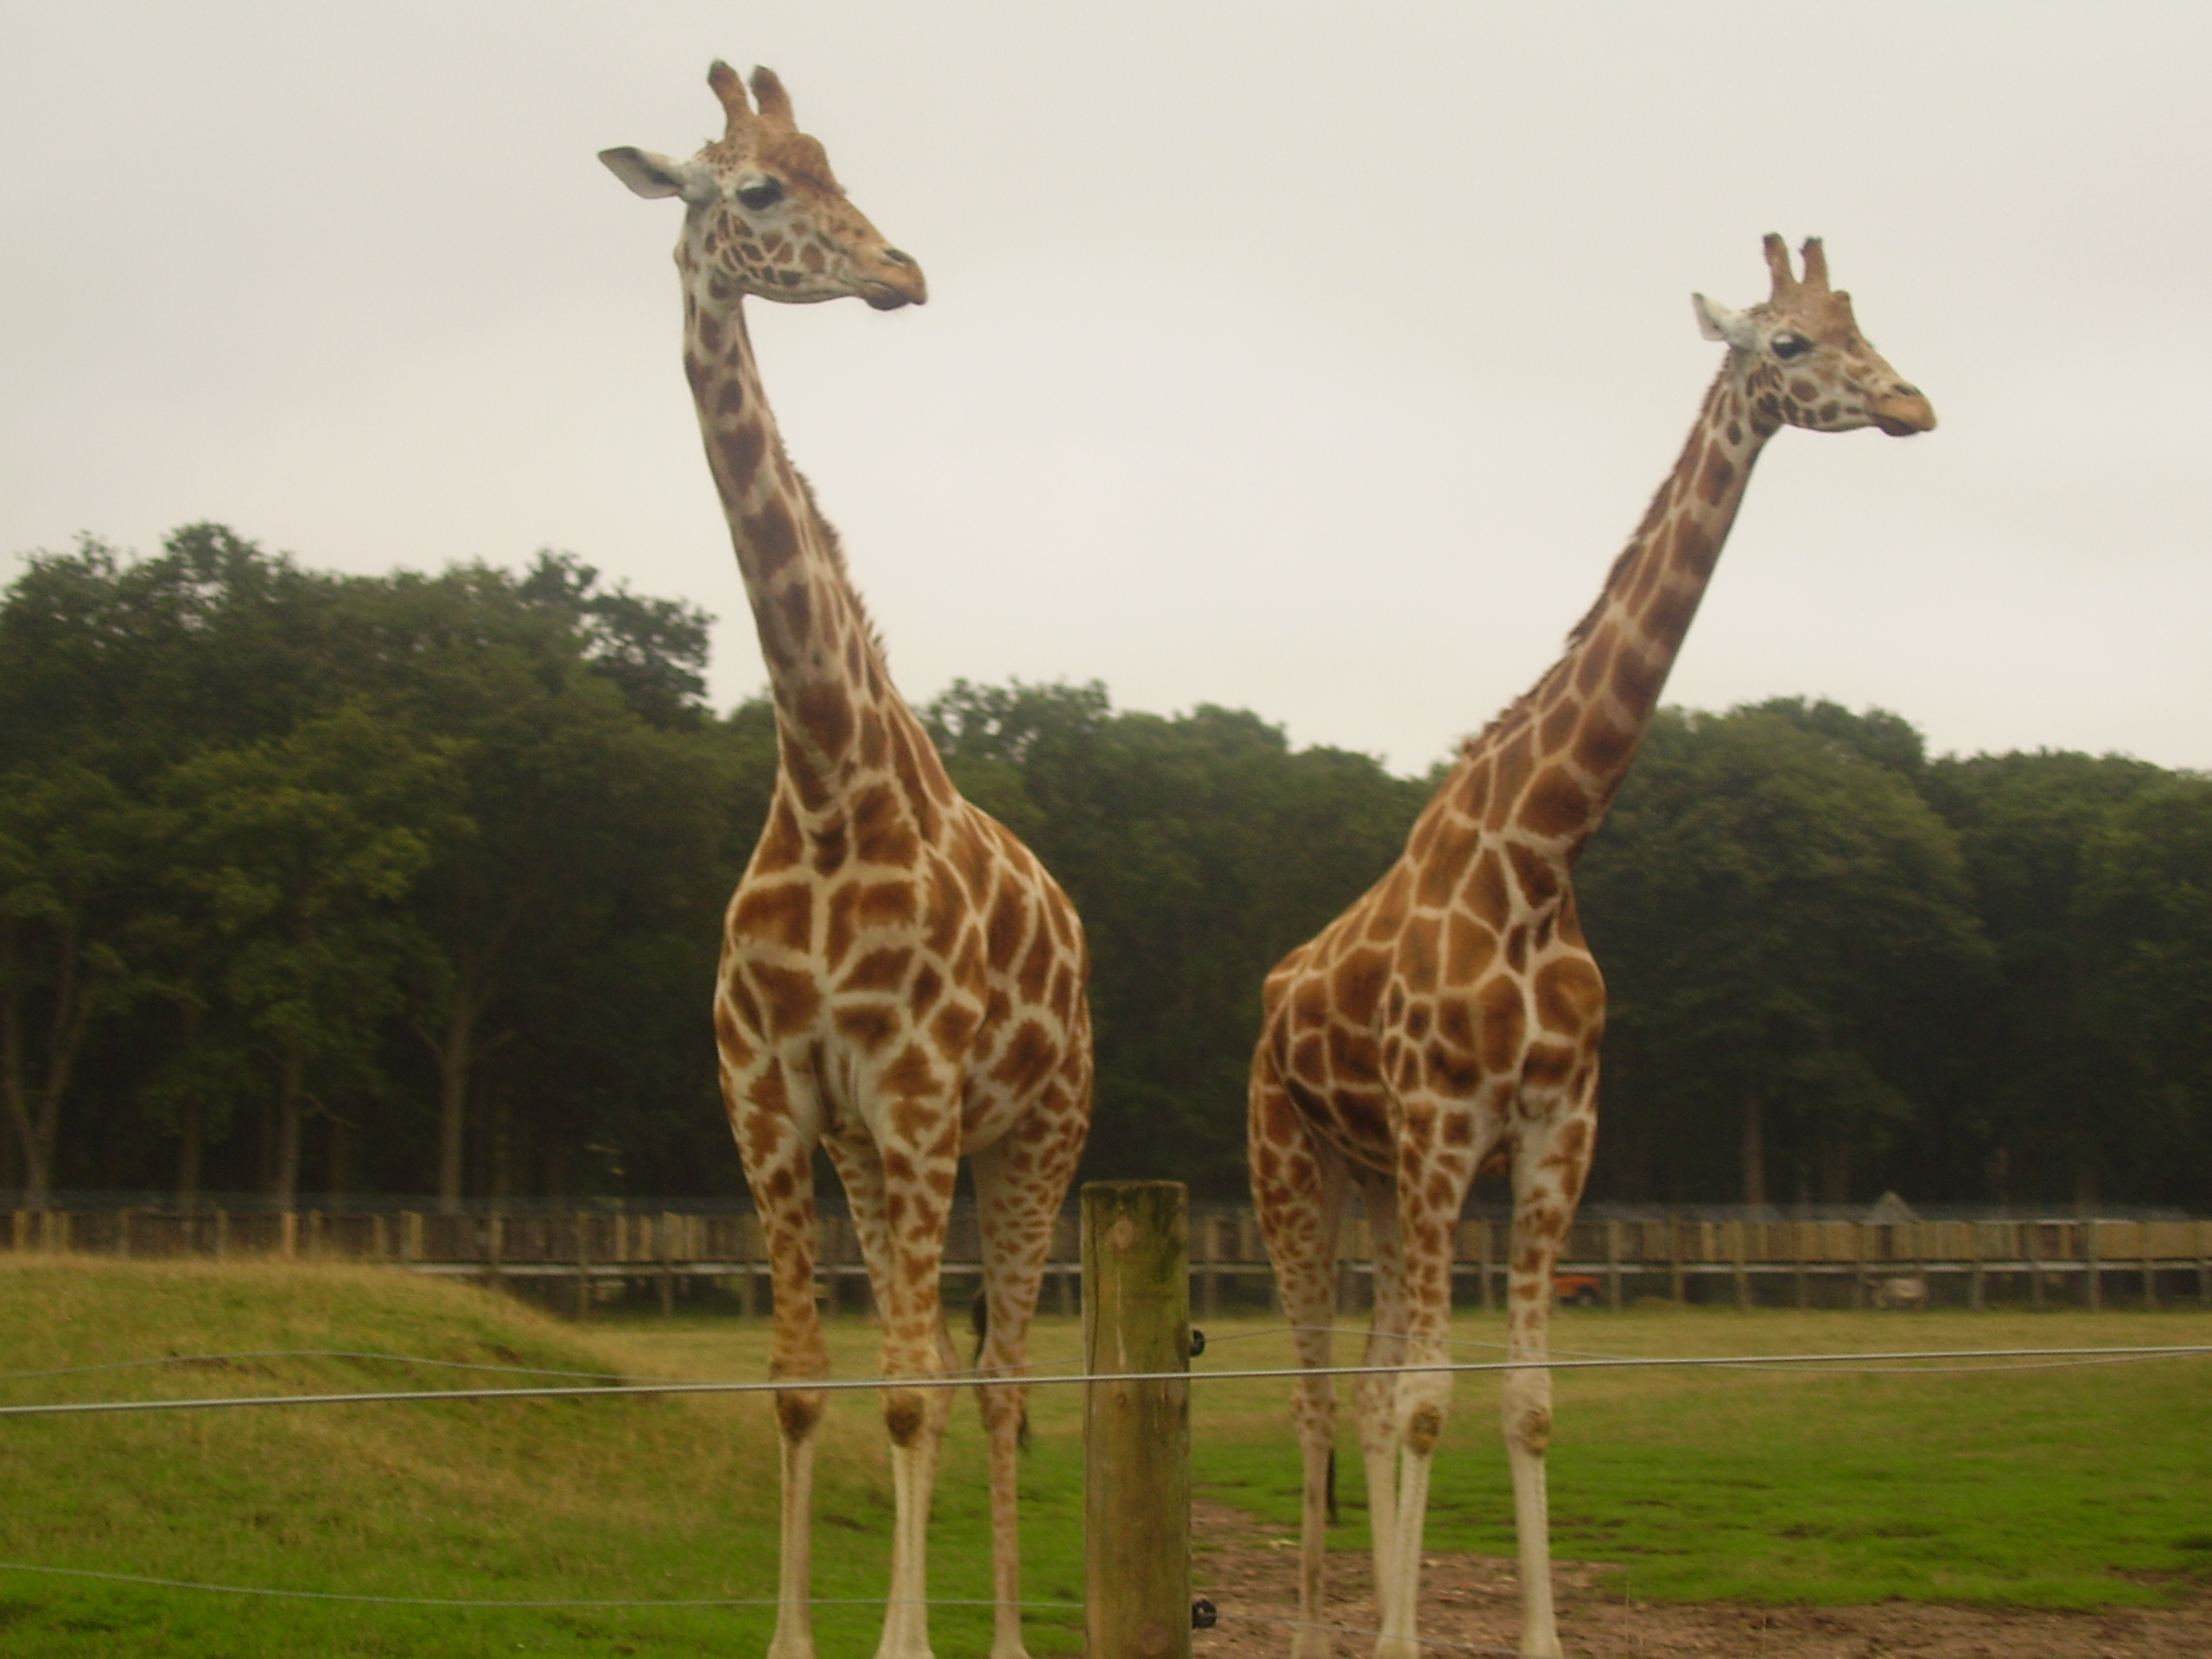 File:Two Rothschild giraffes at Woburn Safari Park.jpg